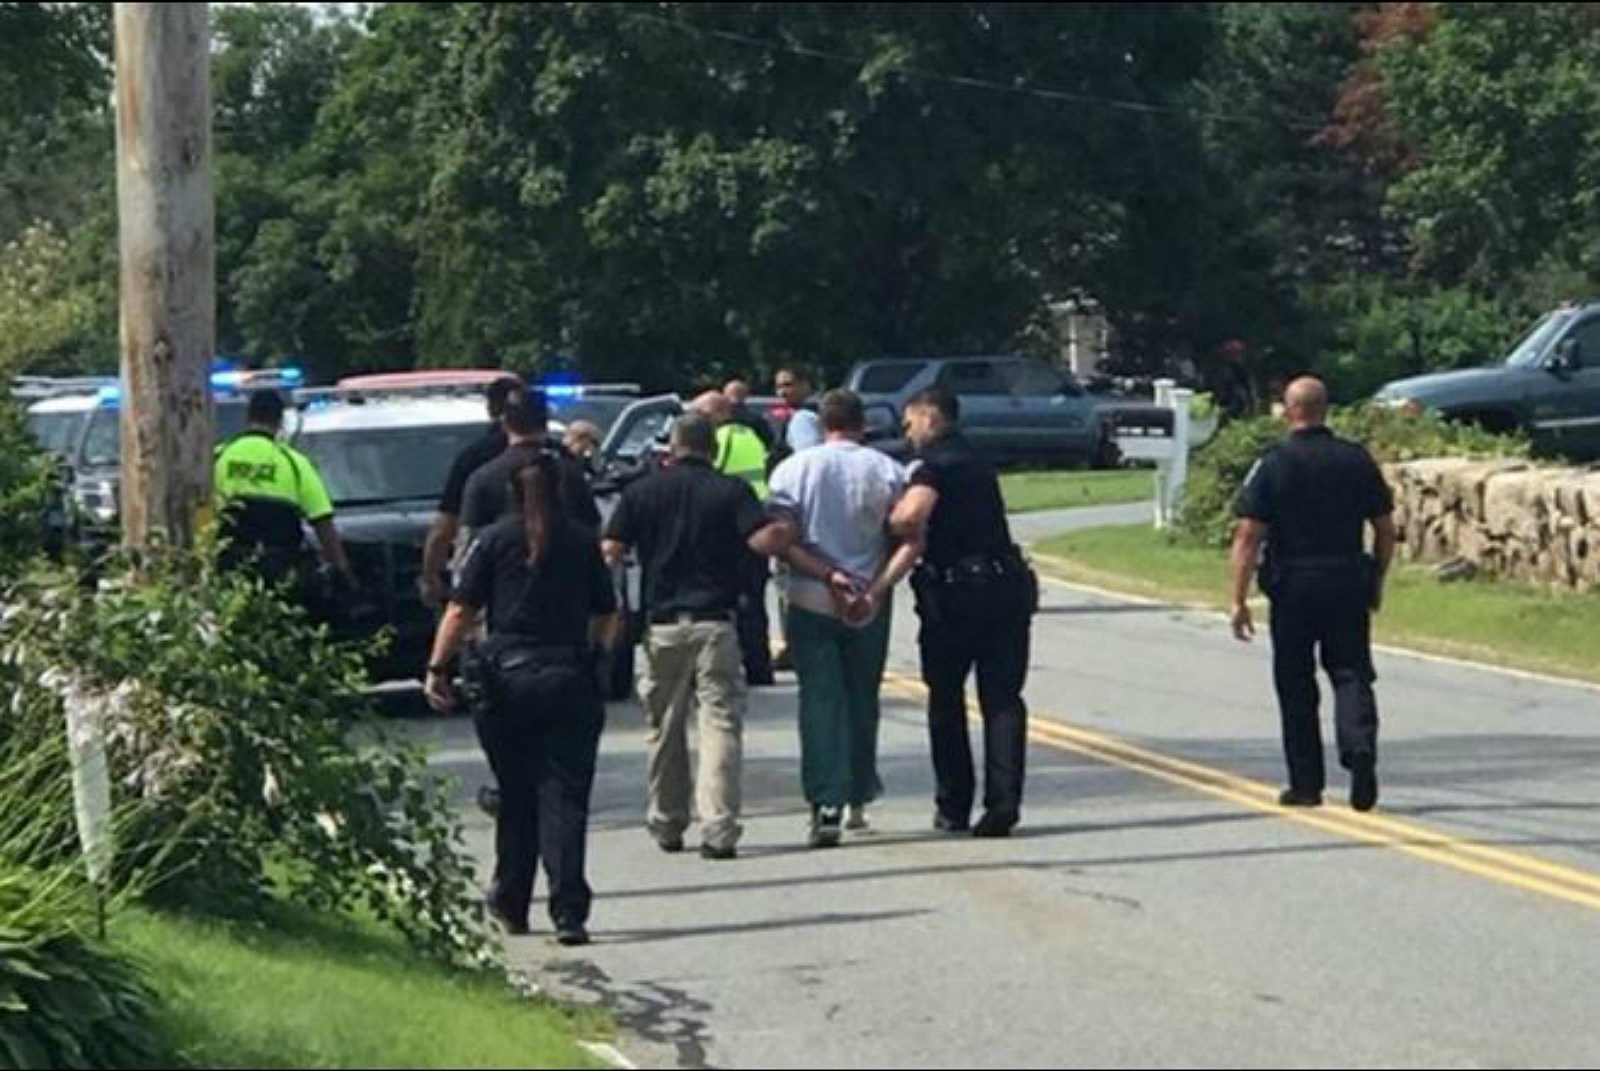 New Bedford Police Arrest Six on Drug Charges